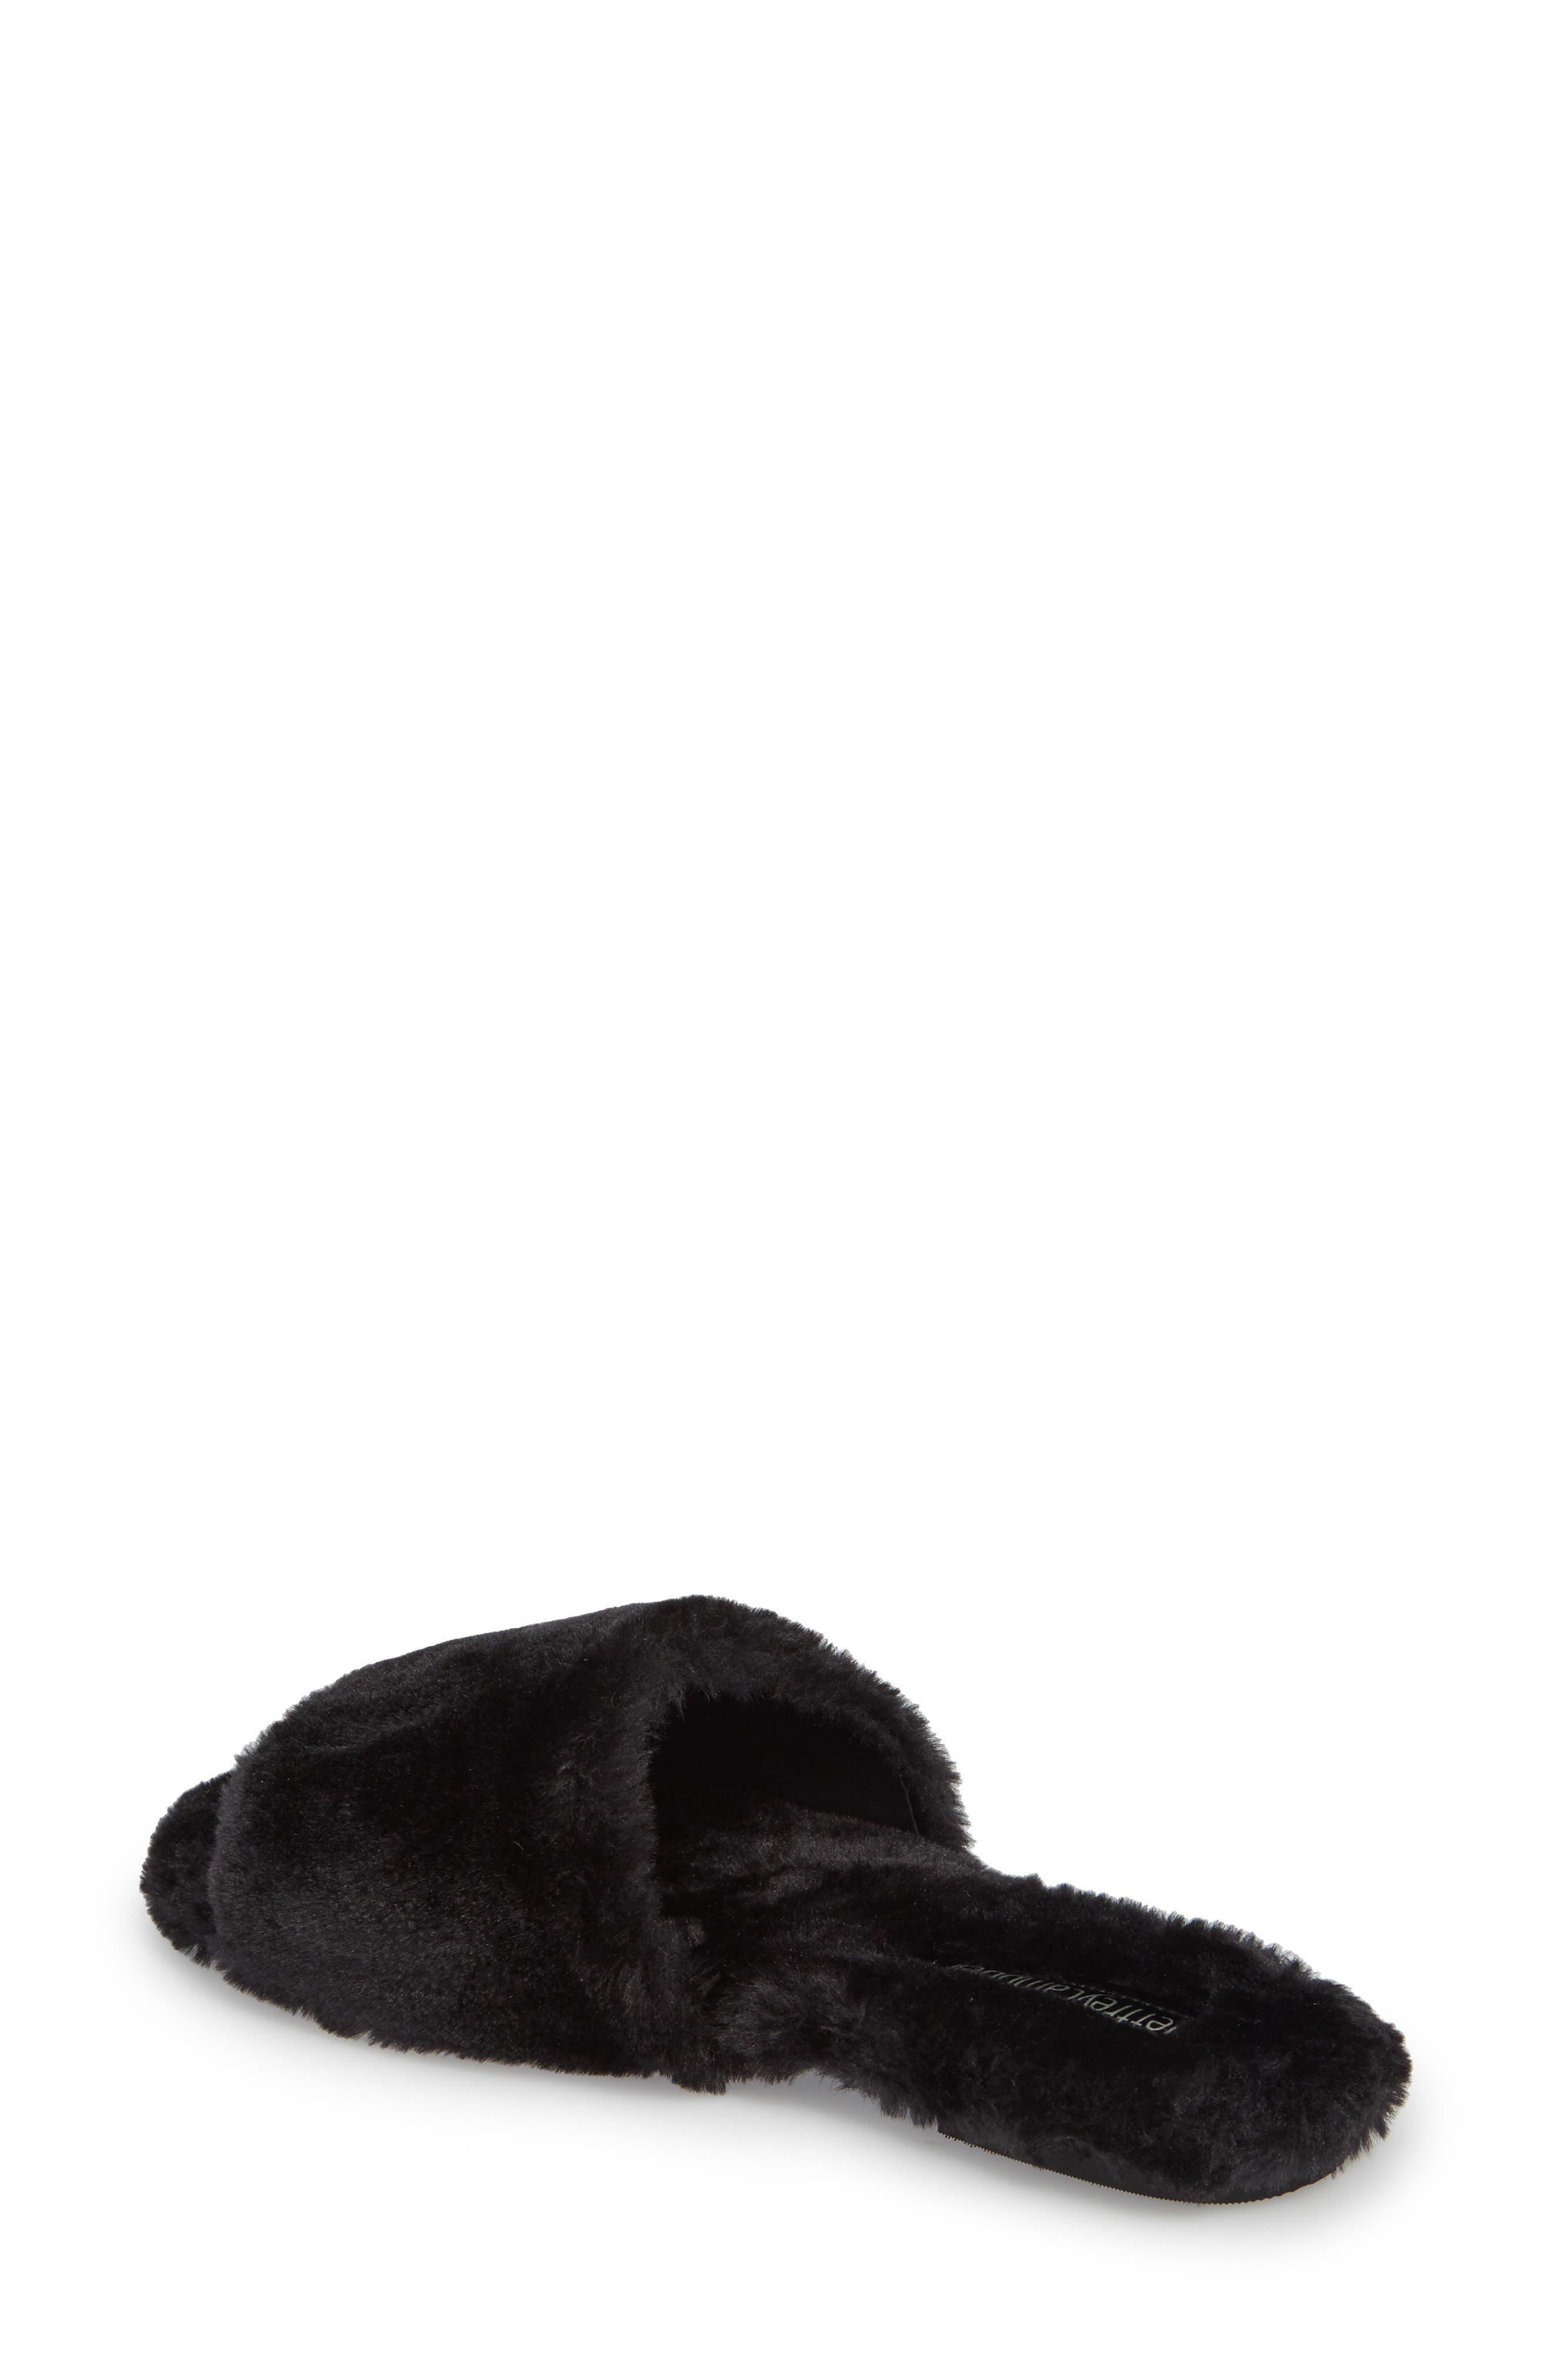 Motel-F Faux Fur Slide Sandal,                             Alternate thumbnail 4, color,